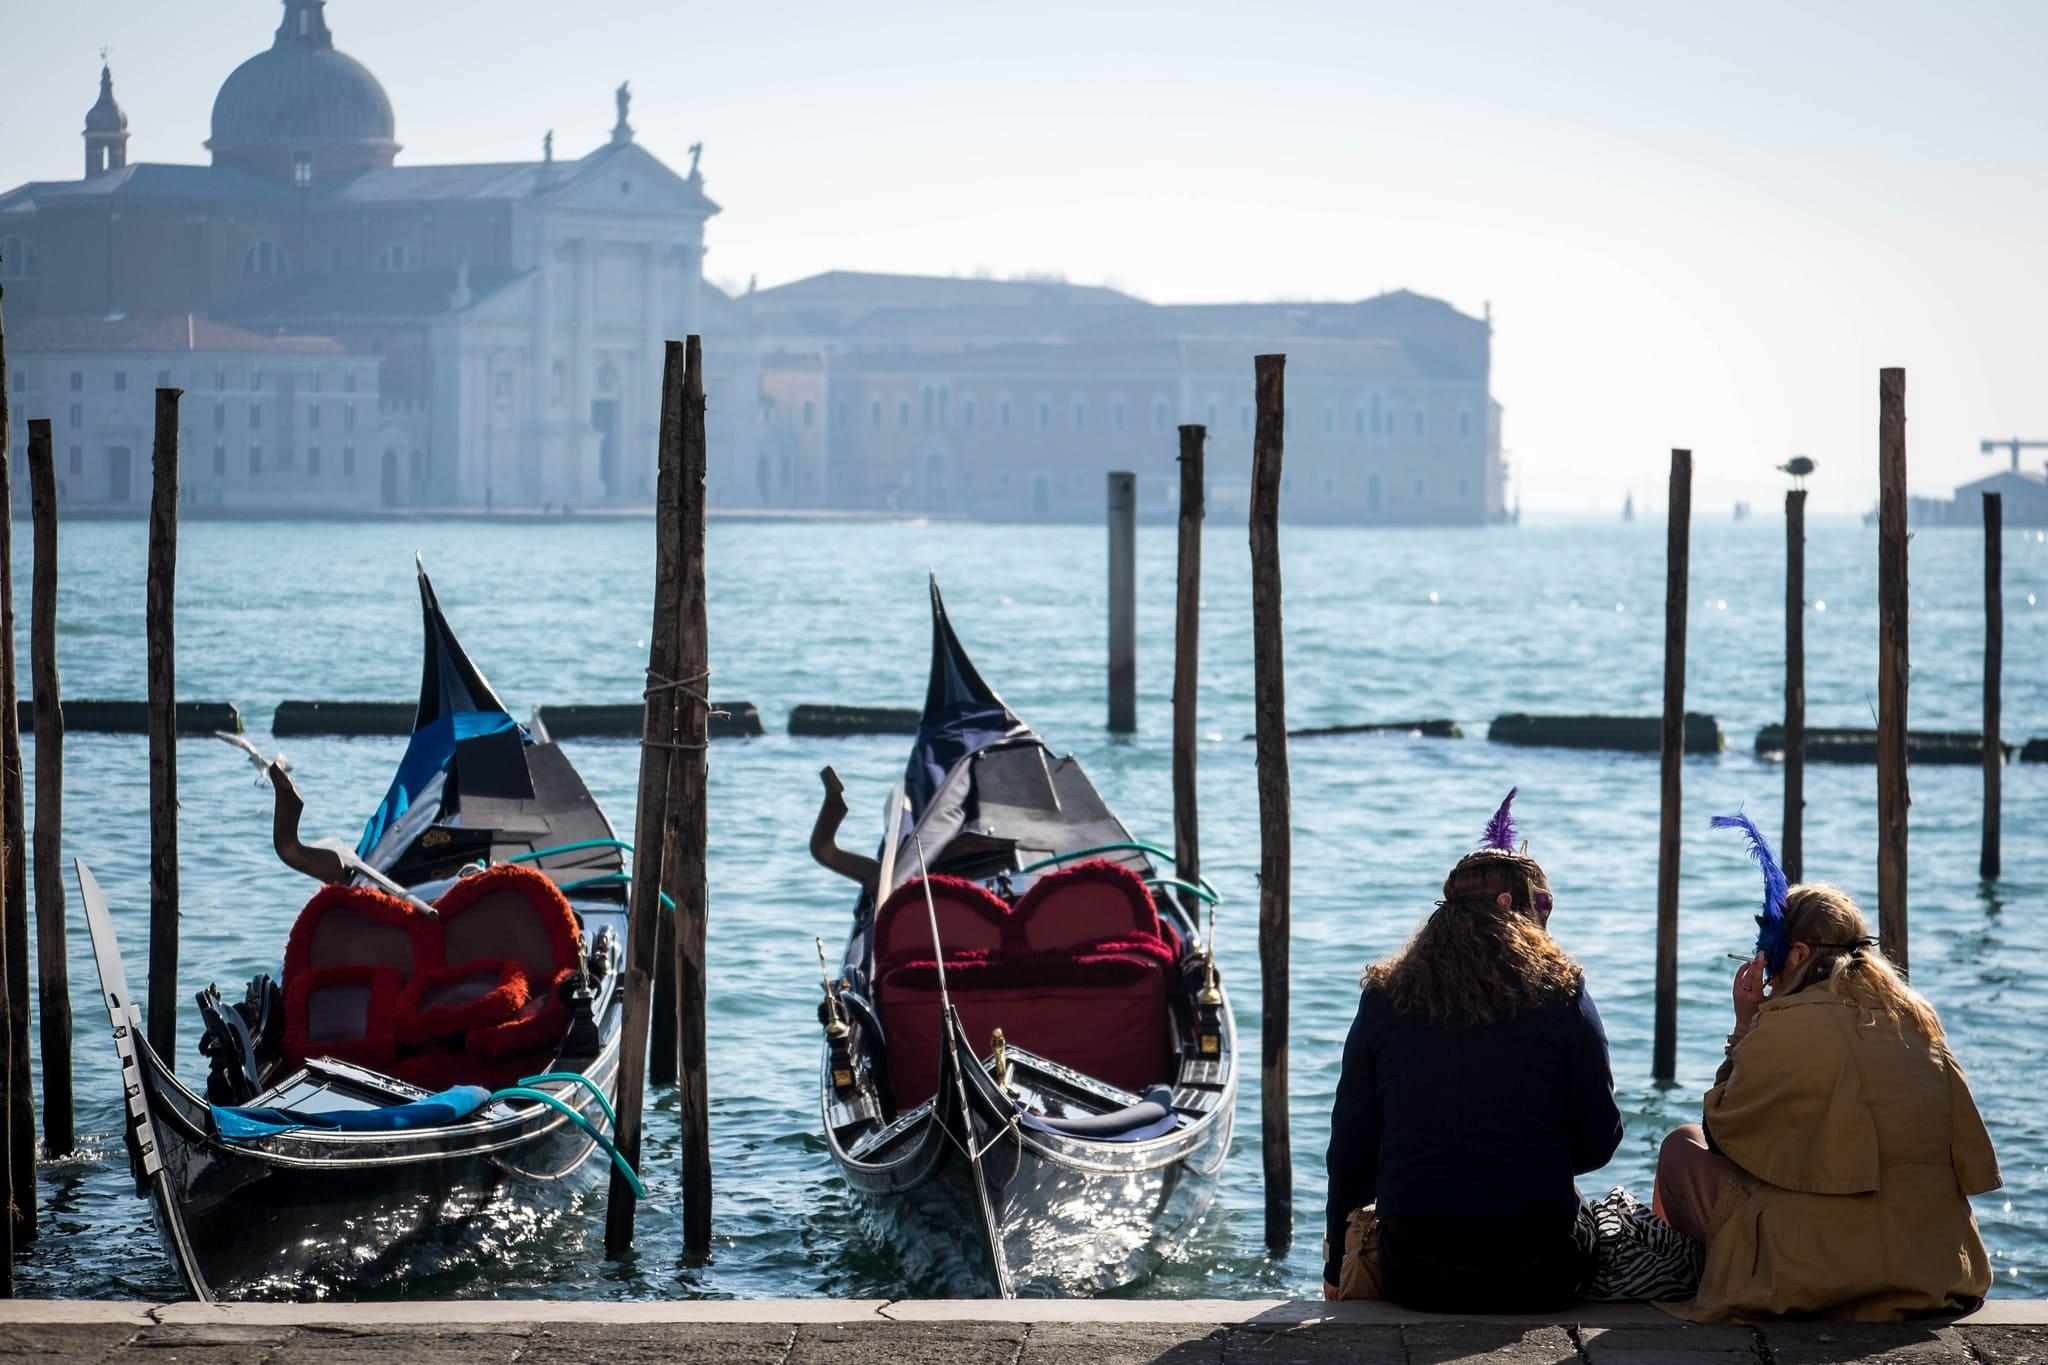 carnevale venezia 2019 programma